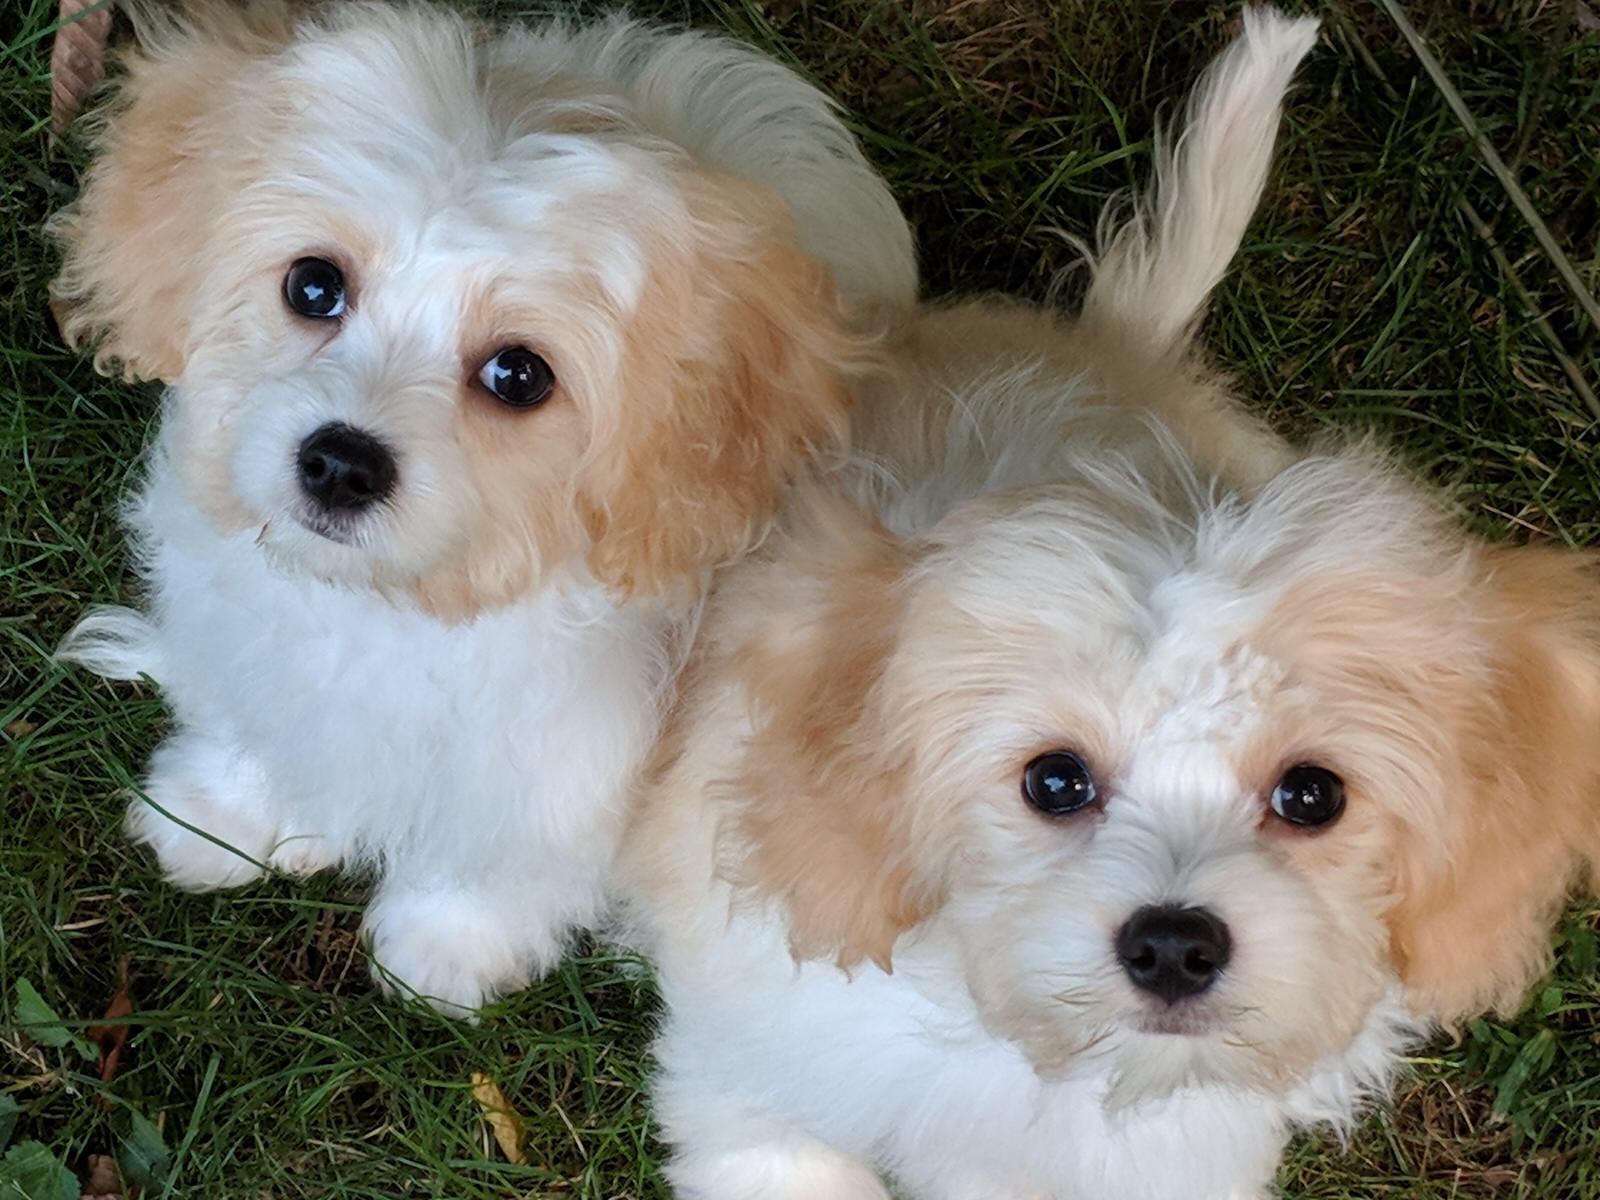 Adorable Cavachon puppies from Foxglove Farm